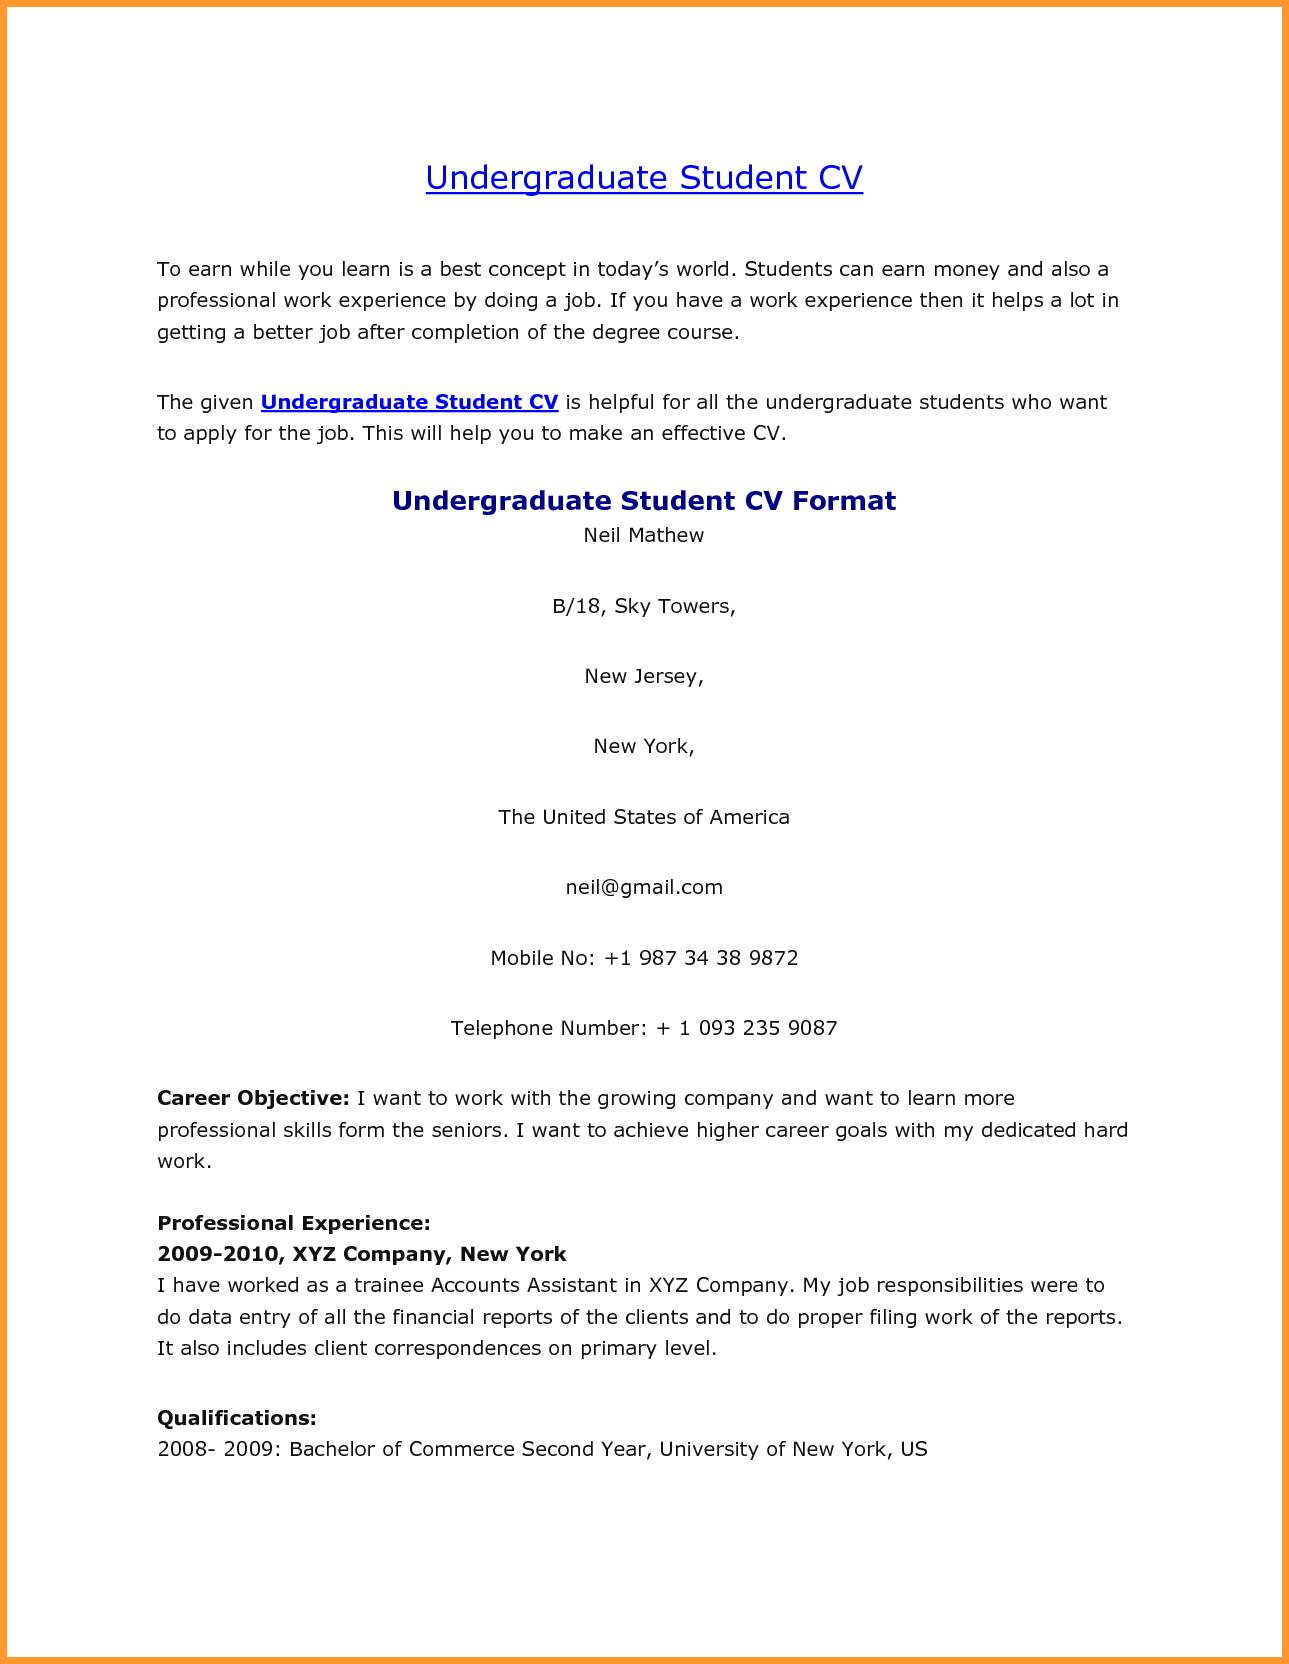 Cv Template Undergraduate Student - Resume Examples